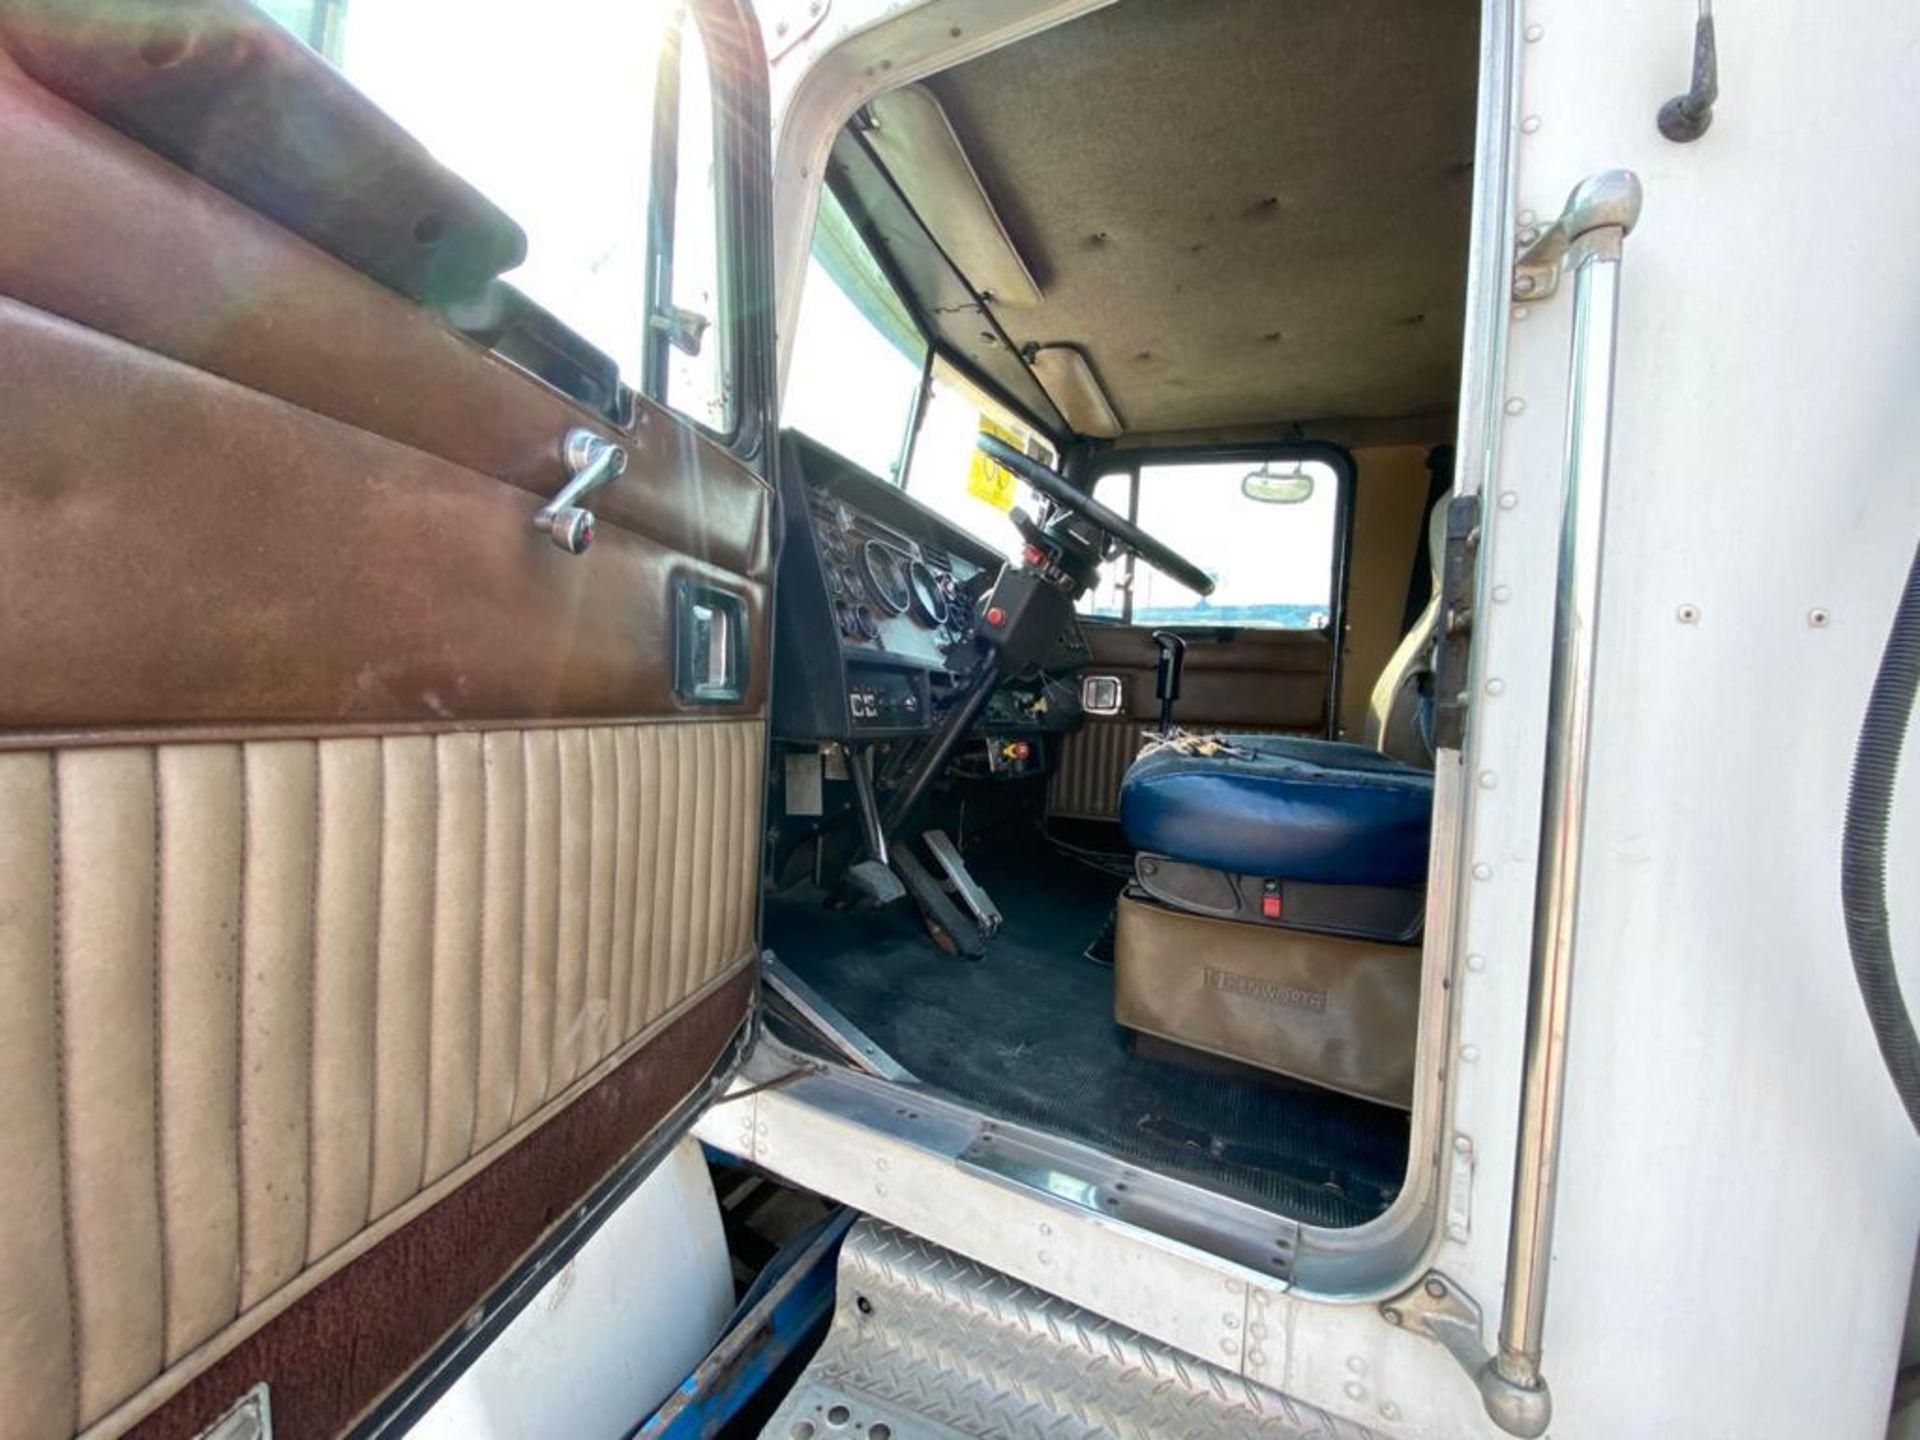 1998 Kenworth Sleeper truck tractor, standard transmission of 18 speeds - Image 28 of 75